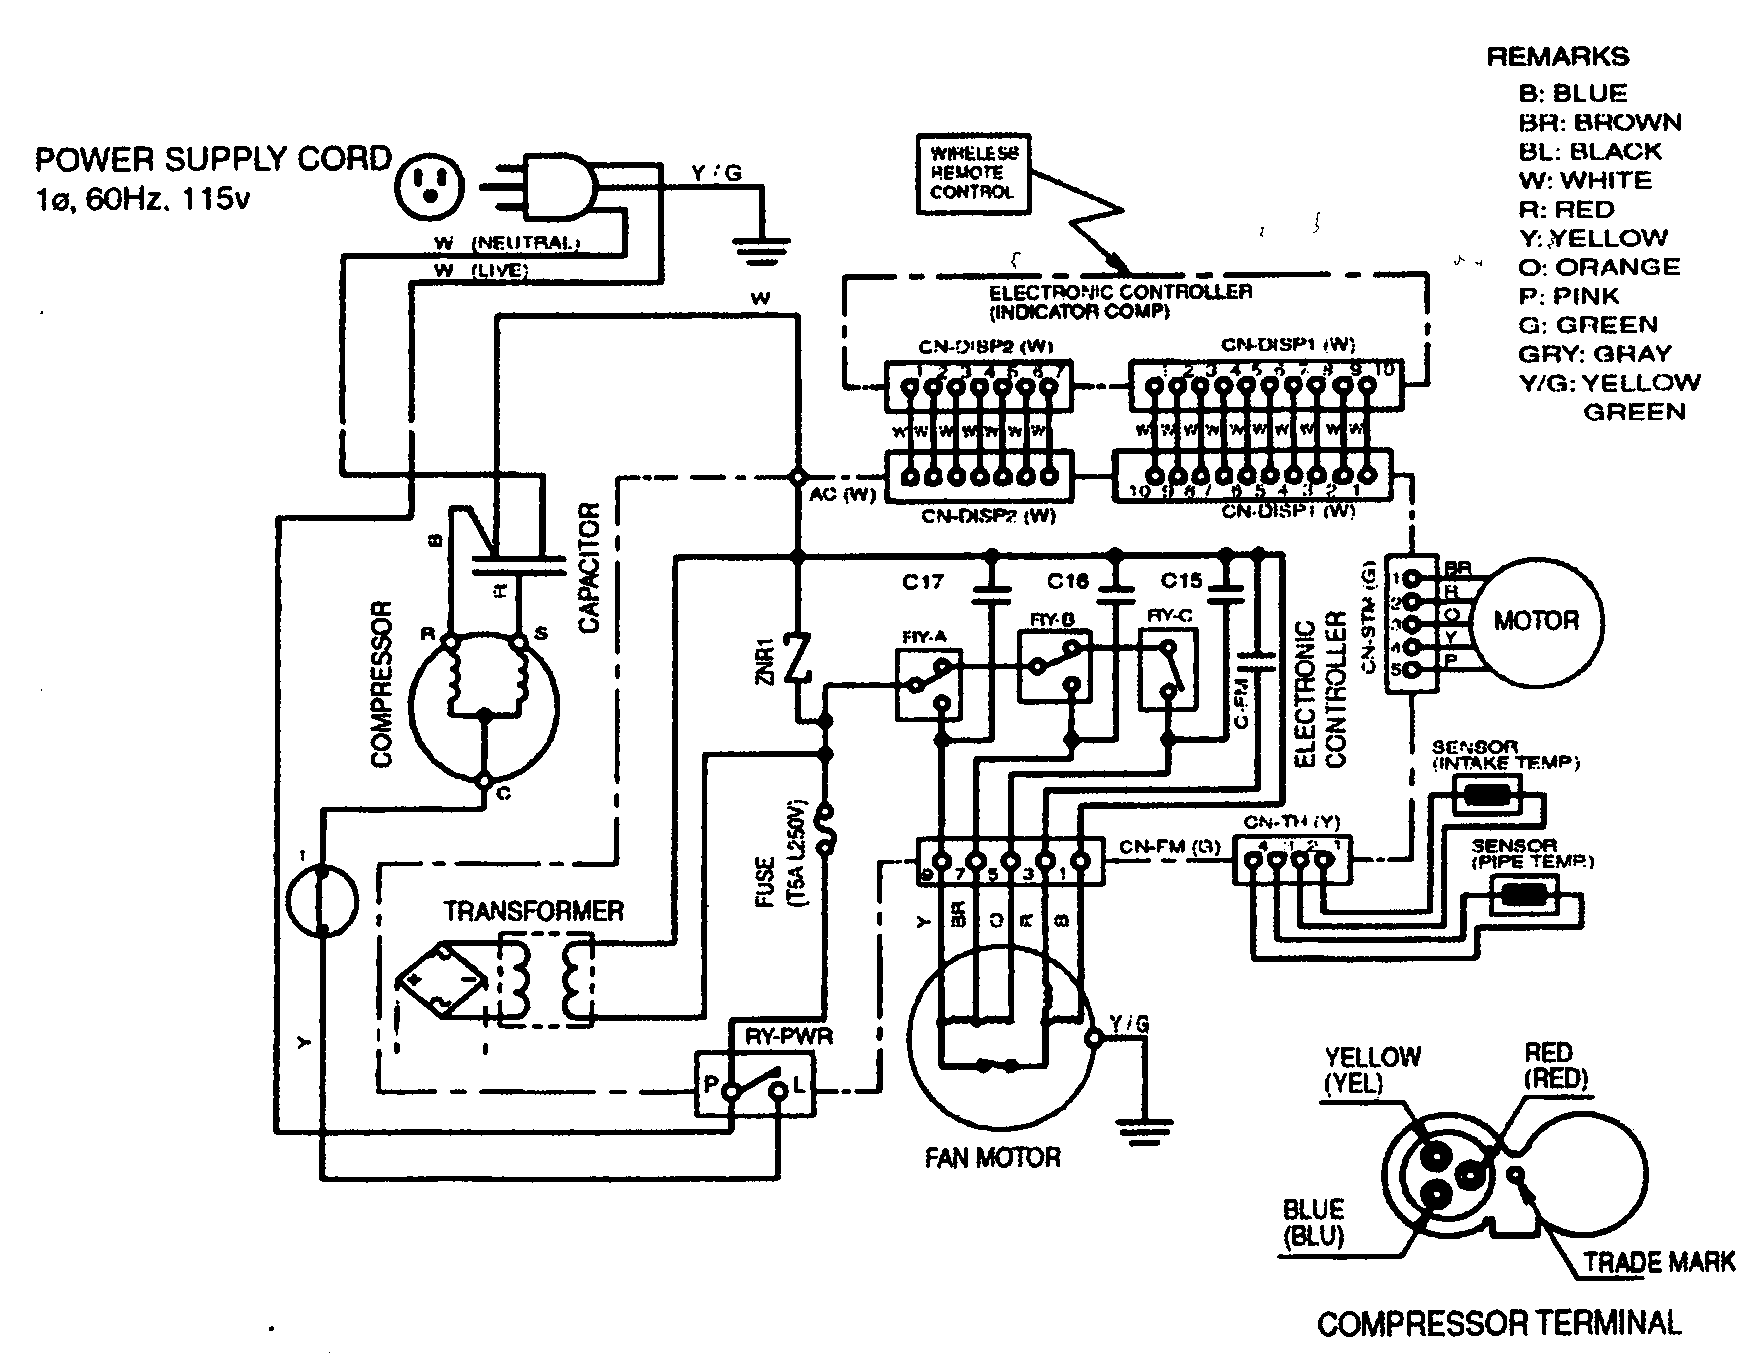 Panasonic Car Cd Player Wiring Diagram Pin Cq C3300u Radio Together With Stereo Audio Model No Df203u Wiringpanasonic